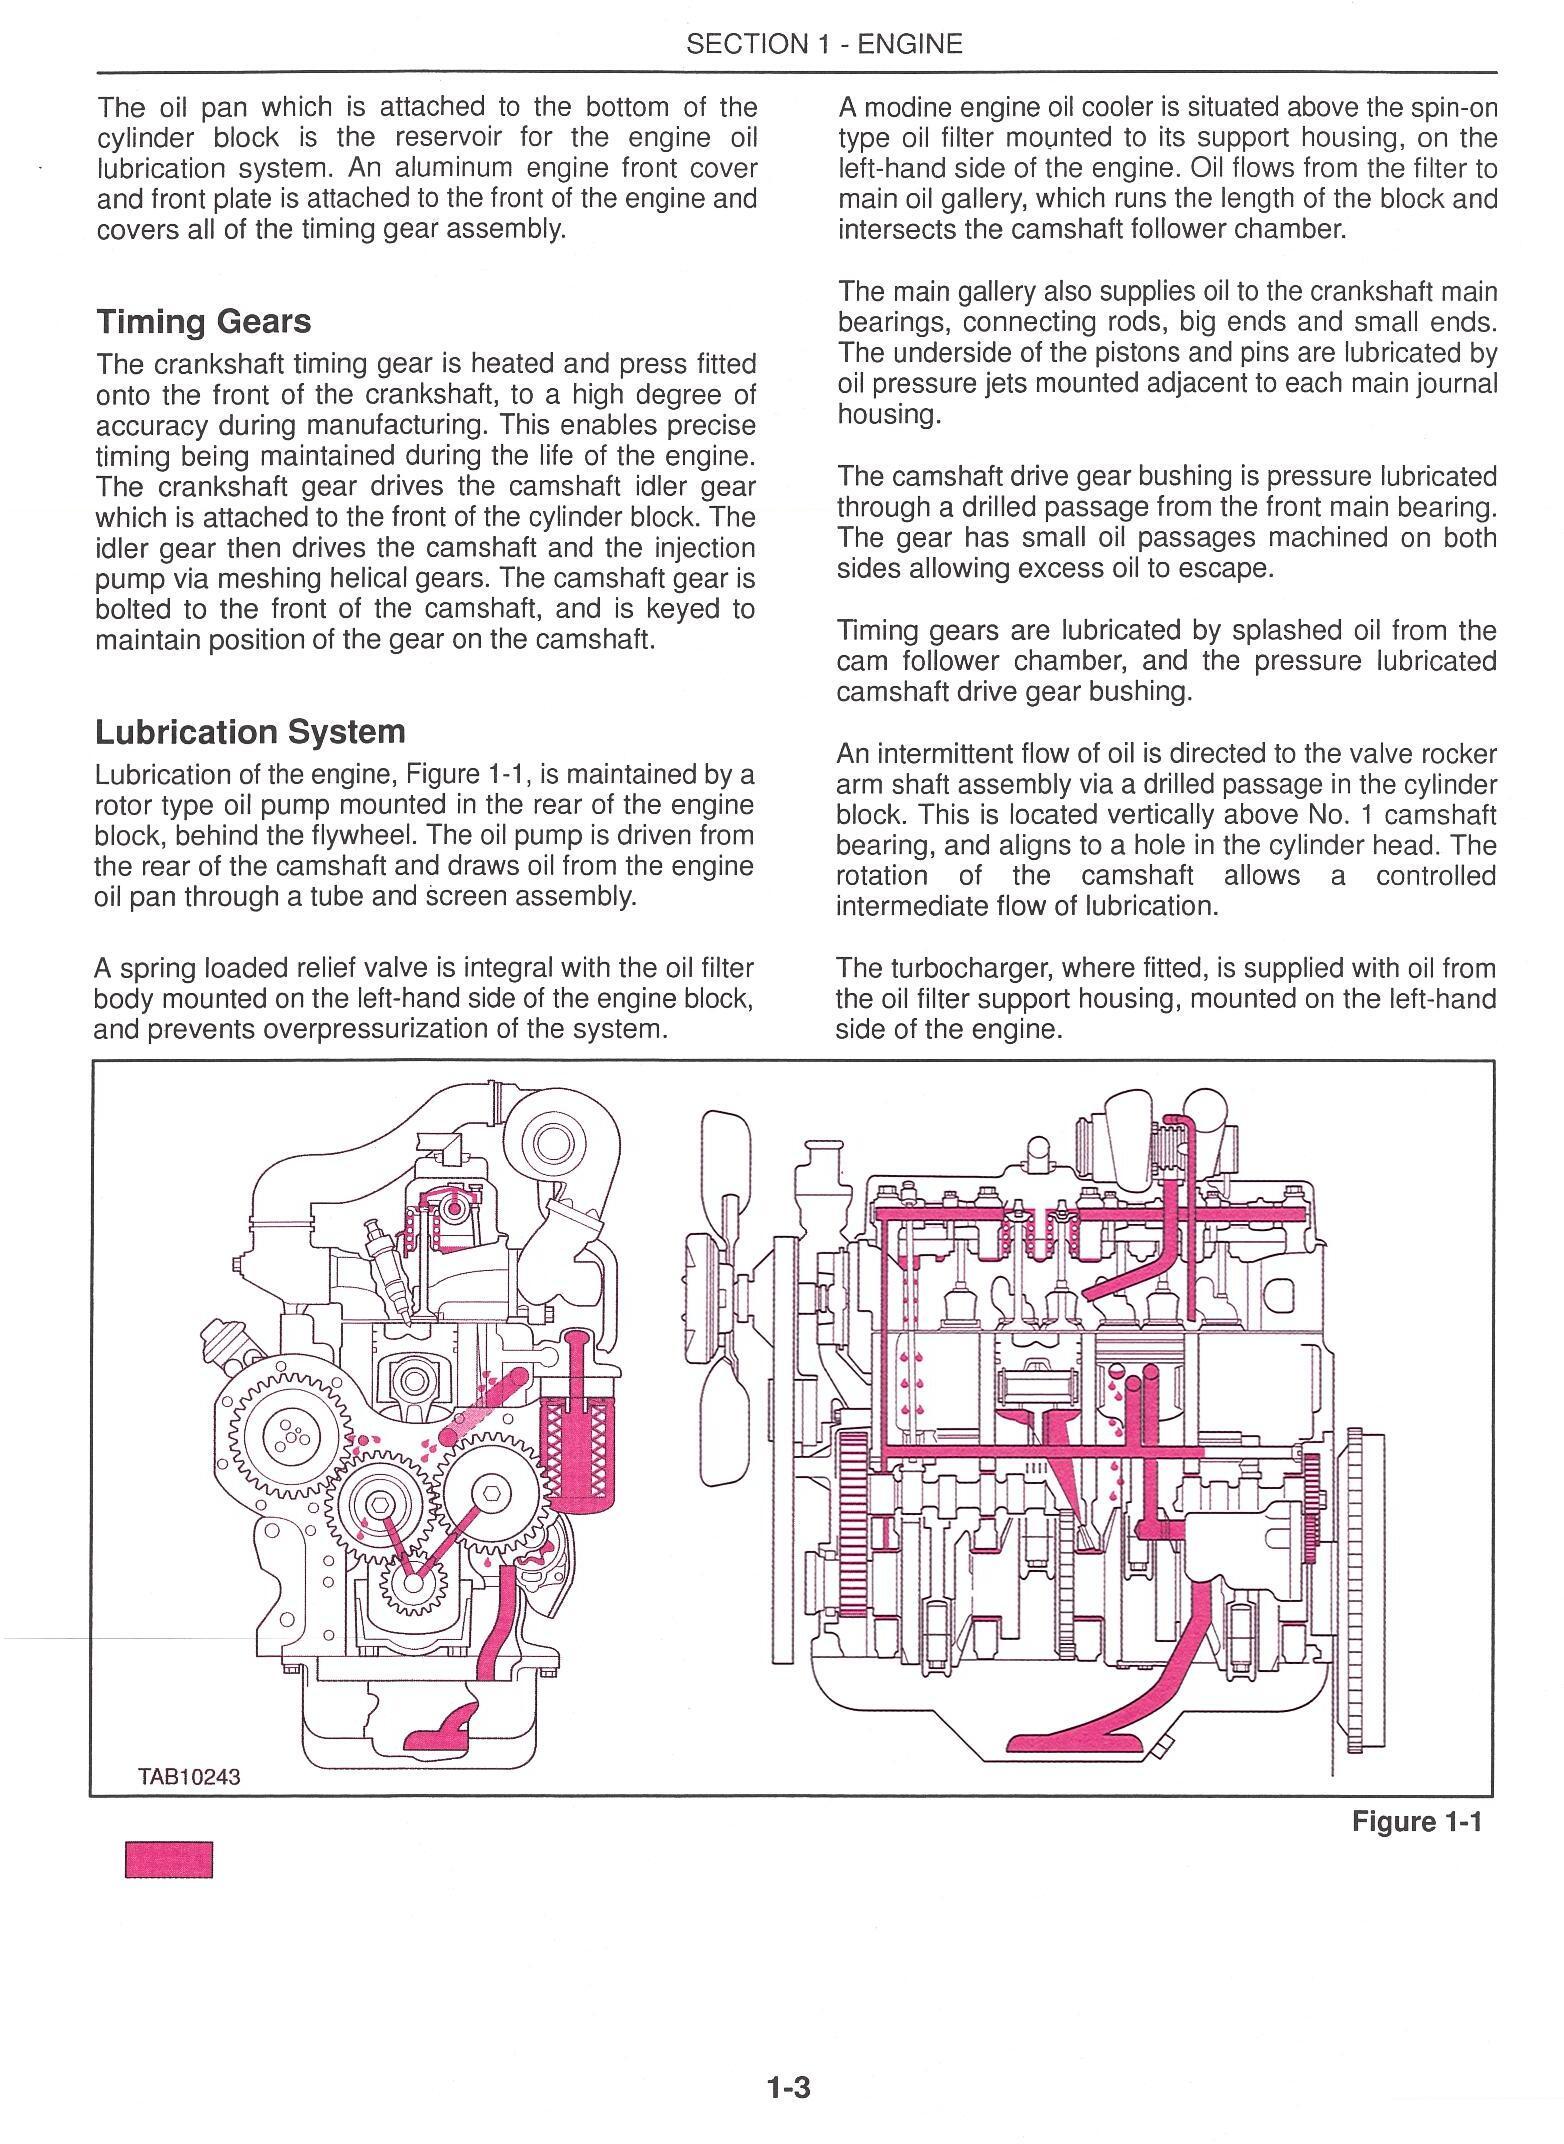 Ford 555E, 575E, 655E, 675E Tractor backhoe Loader Service Repair Manual - 1